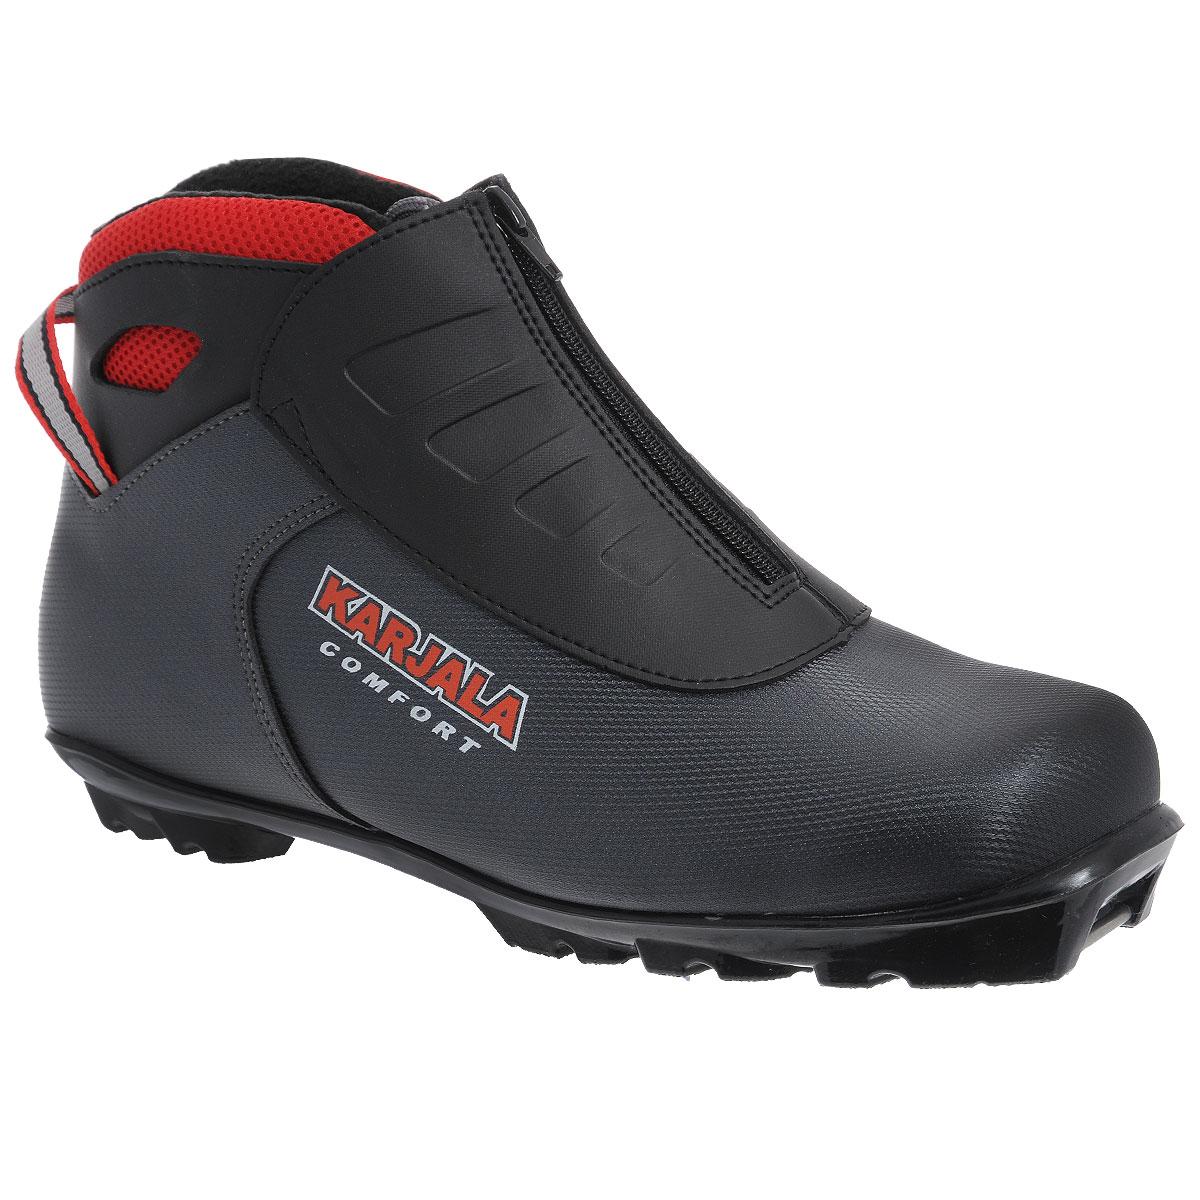 Karjala (Карелия) Ботинки для беговых лыж Comfort NNN Comfort NNN_серый